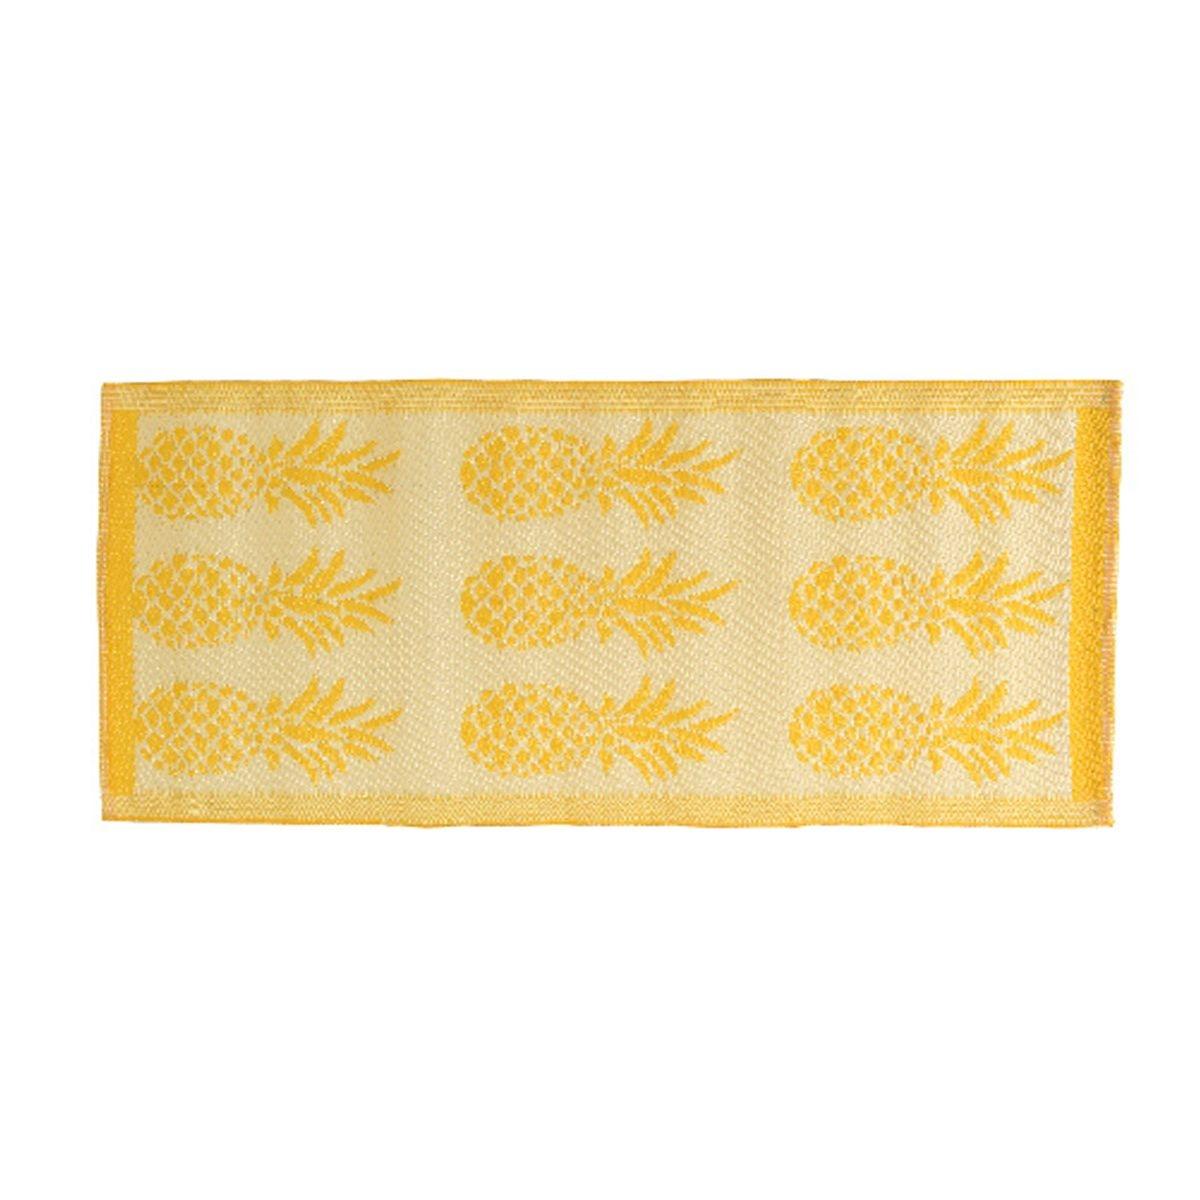 Tapis rectangulaire en polypropylène 140 x 70 cm motifs ananas Jaune - Jardideco